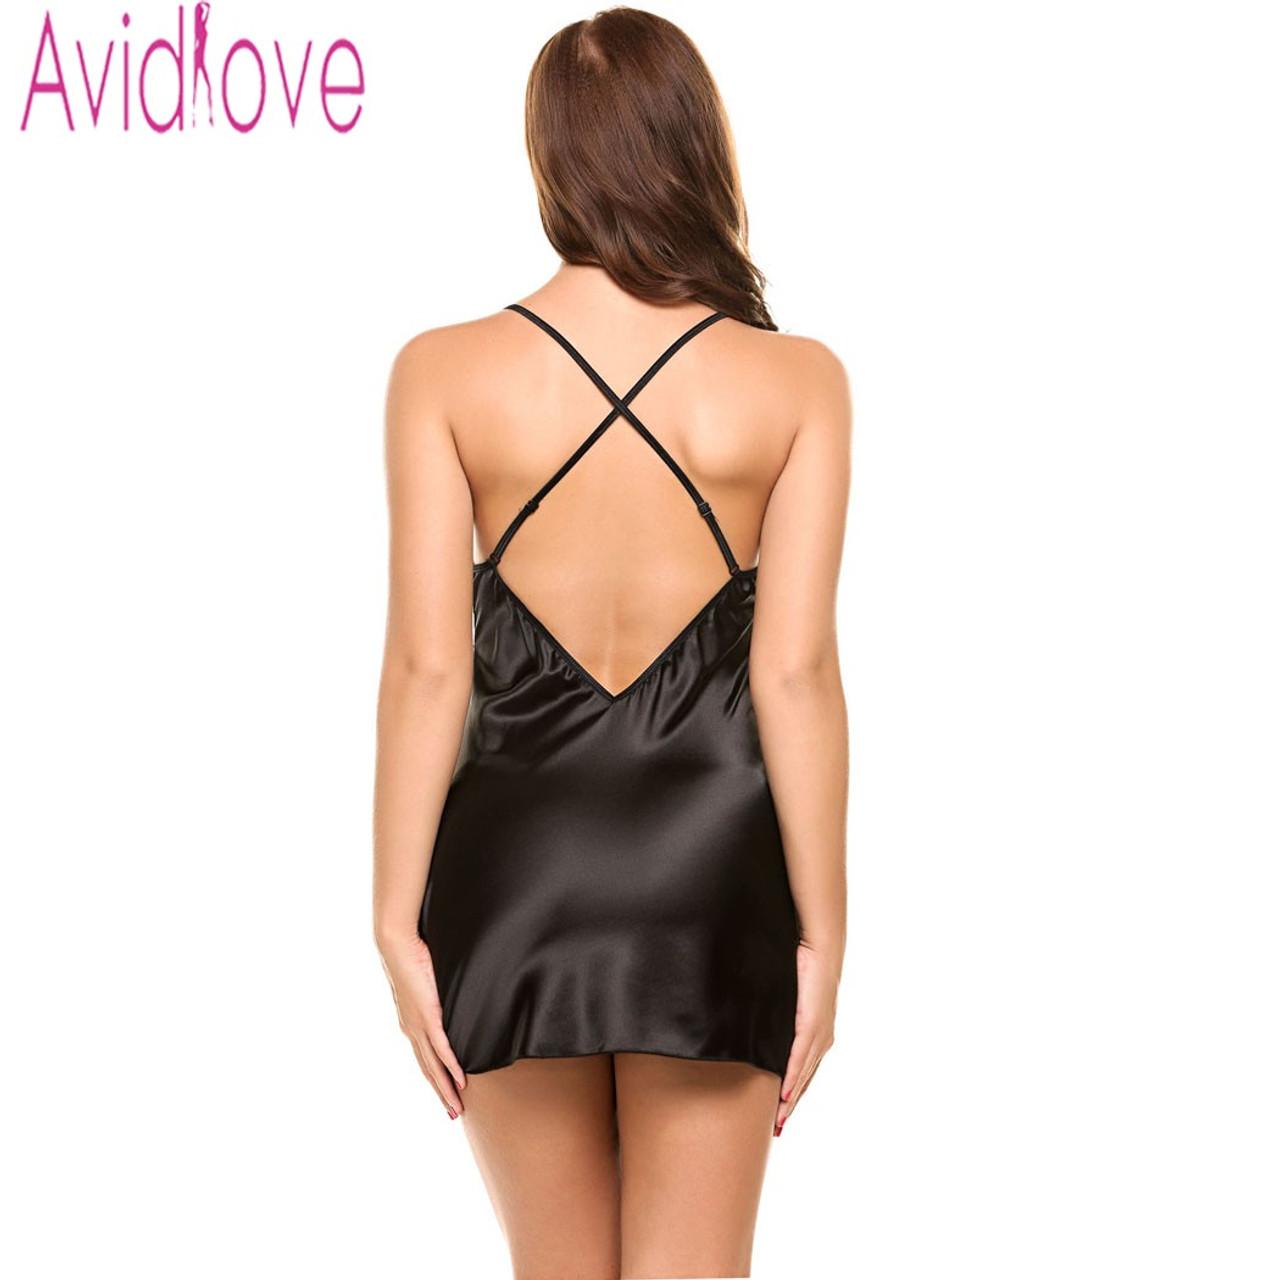 ... Avidlove Sexy Nightgown Lingerie Fashion Patchwork Nightdress Women  Sheer Scalloped Satin Nightwear Silk Slip Sleepwear Chemises 2a009a4b1